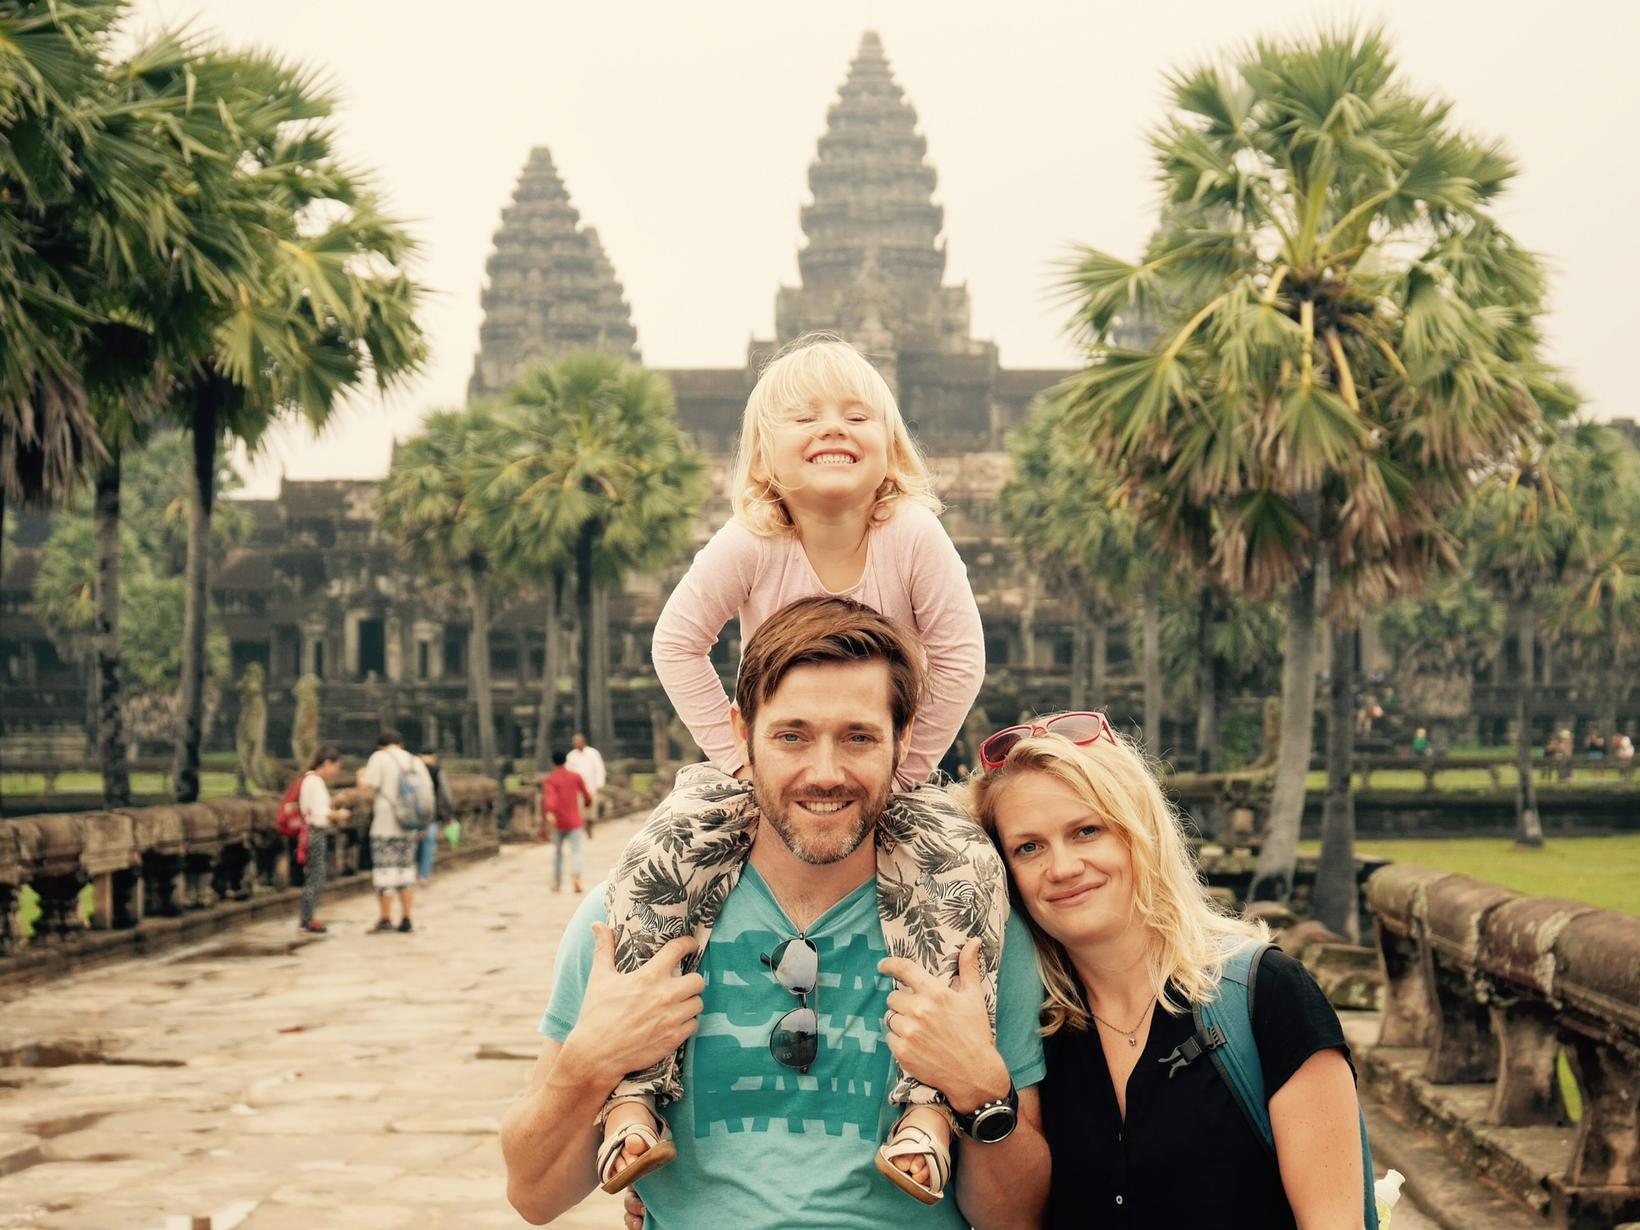 Ilona & Mitchell from London, United Kingdom